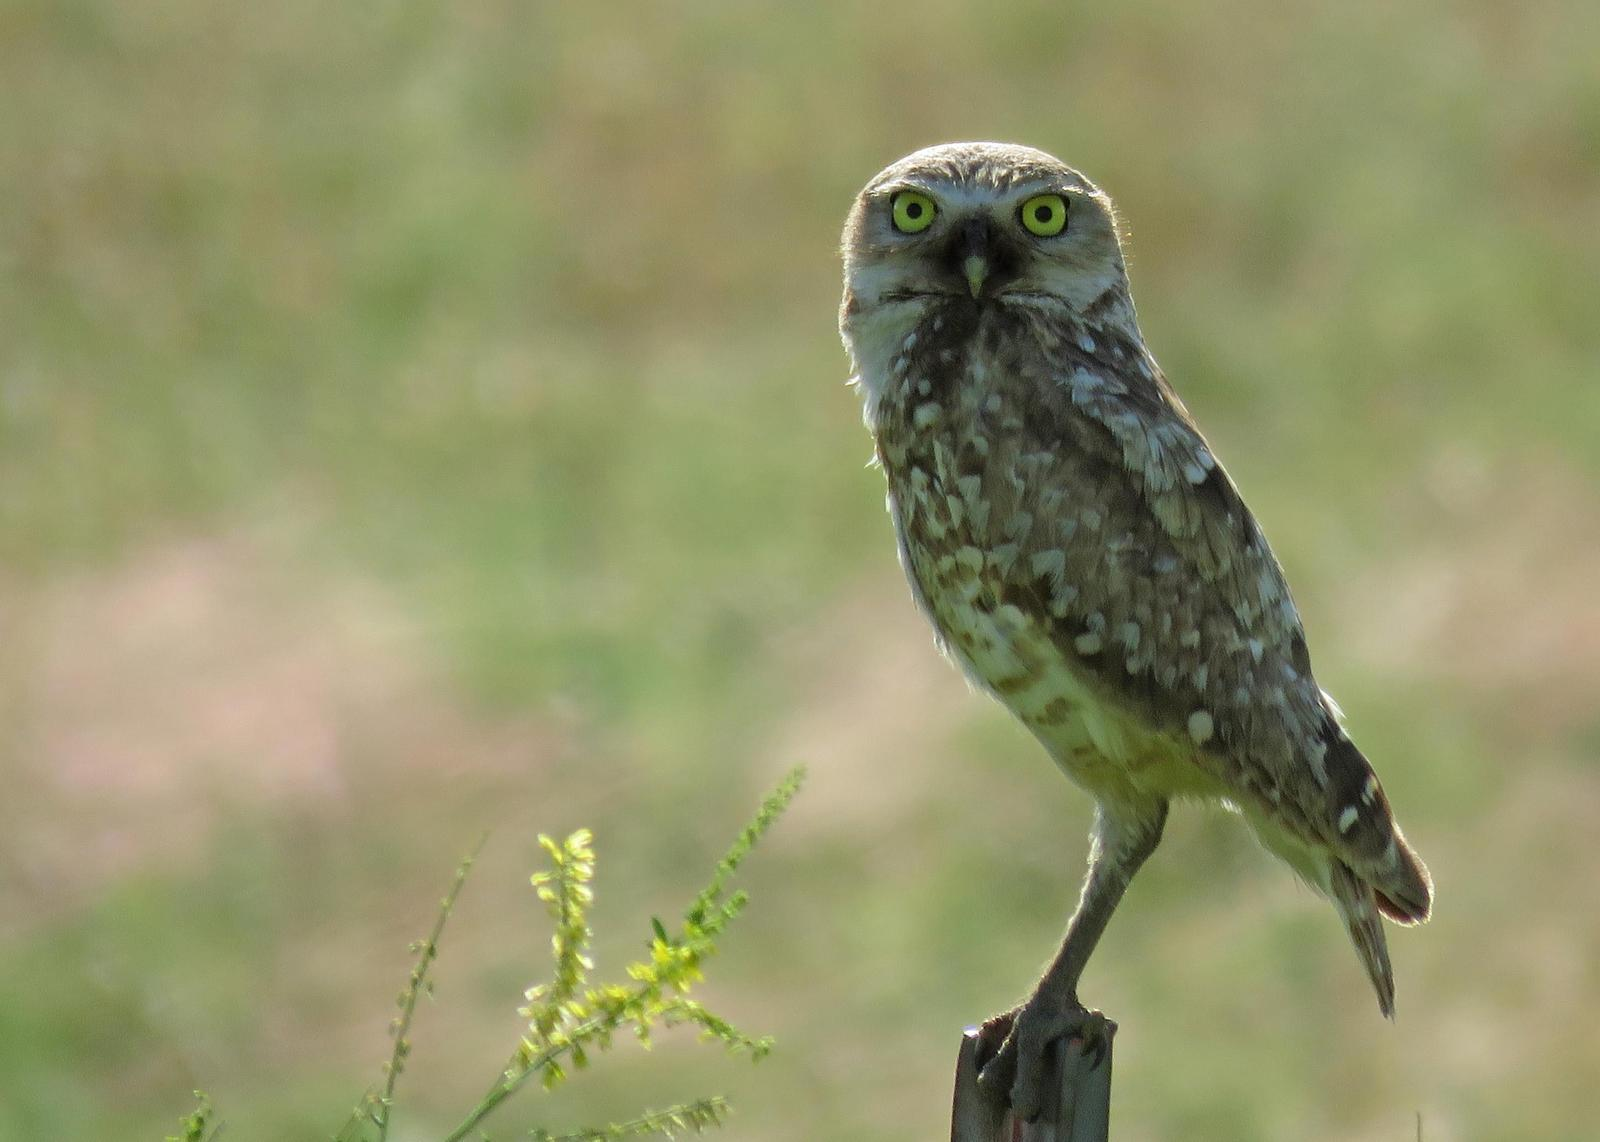 Burrowing Owl Photo by Kelly Preheim